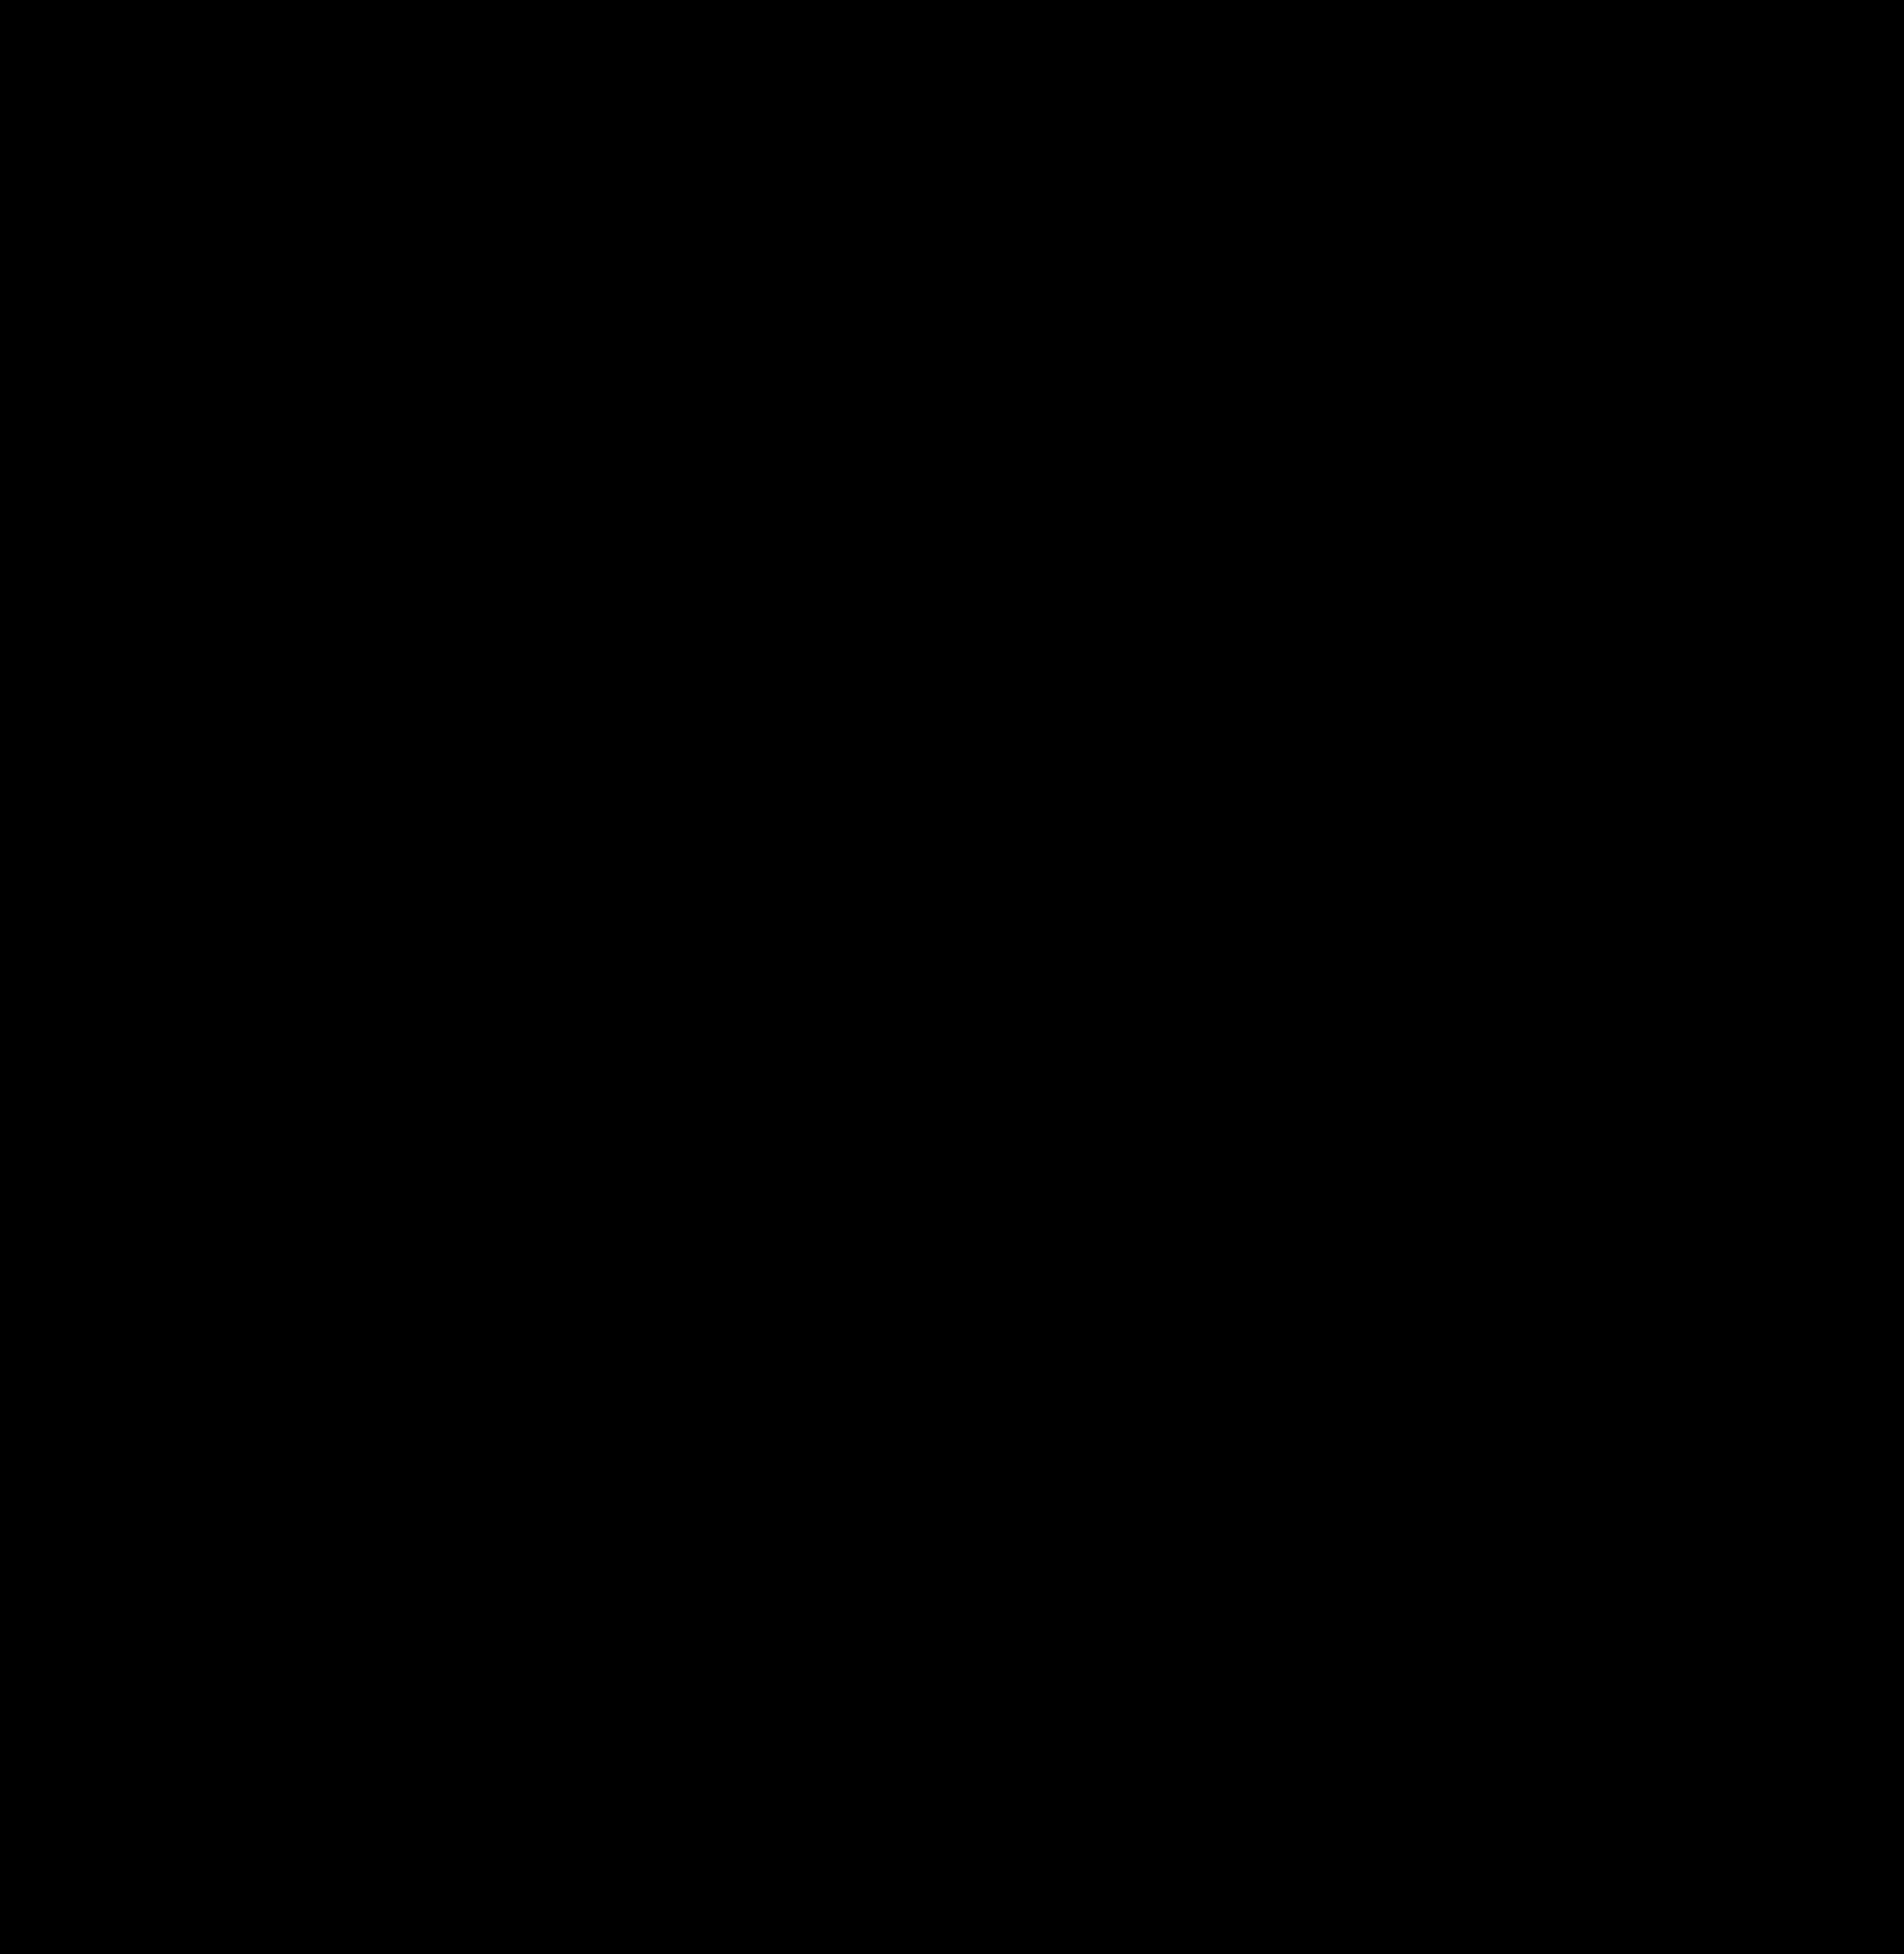 Kuchyňská baterie SCHOCK PAPILIO 588000 Carbonium